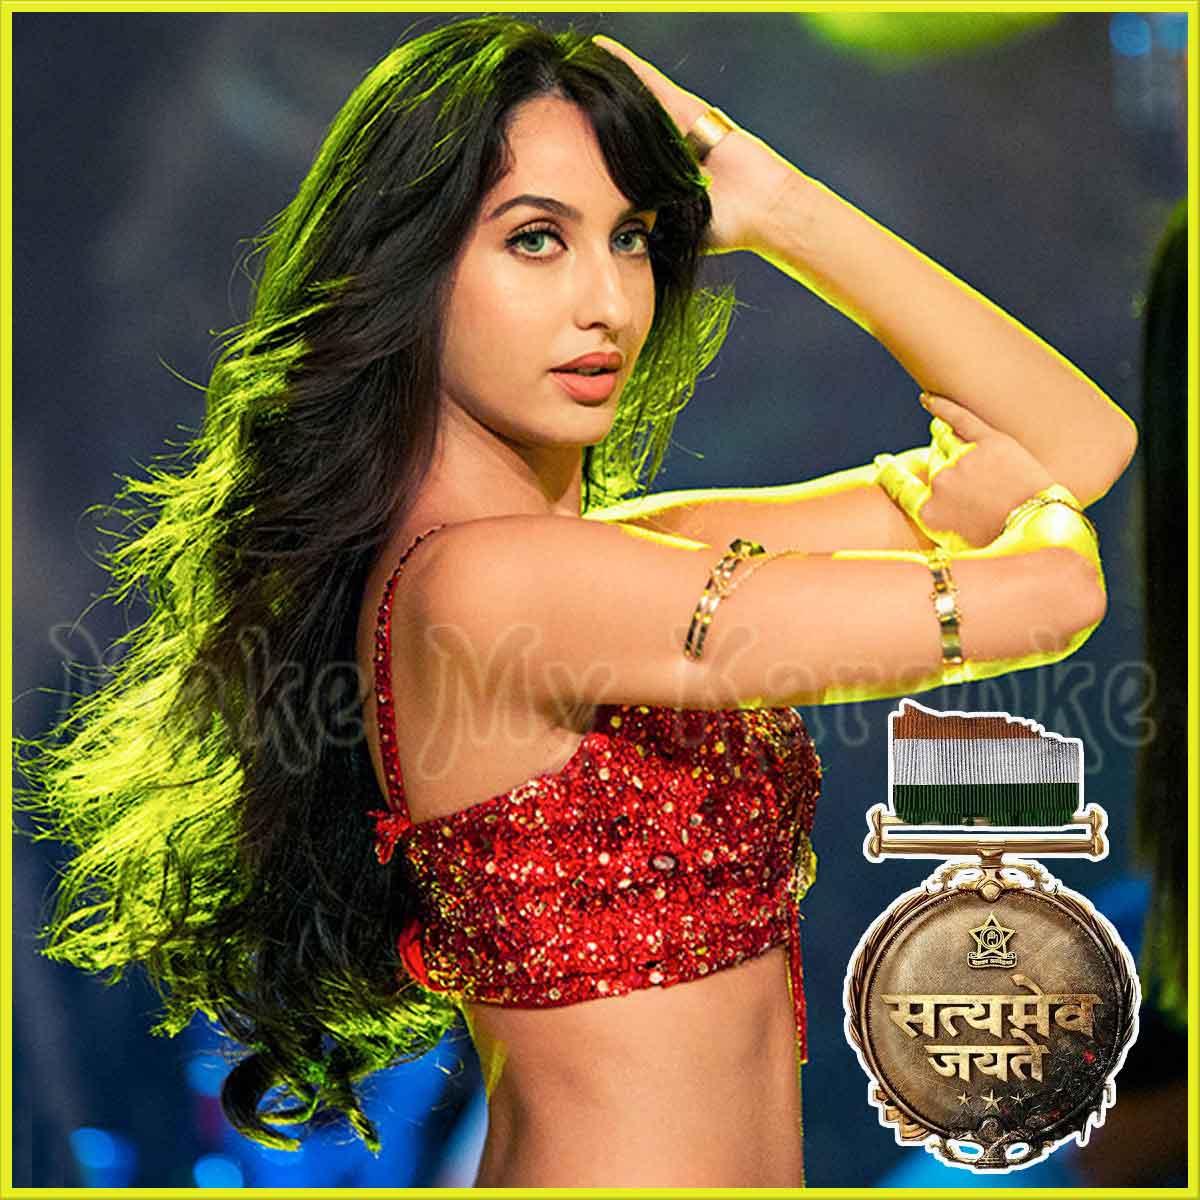 Dilbar dilbar new version mp3 download by neha kakkar | Dilbar Mp3